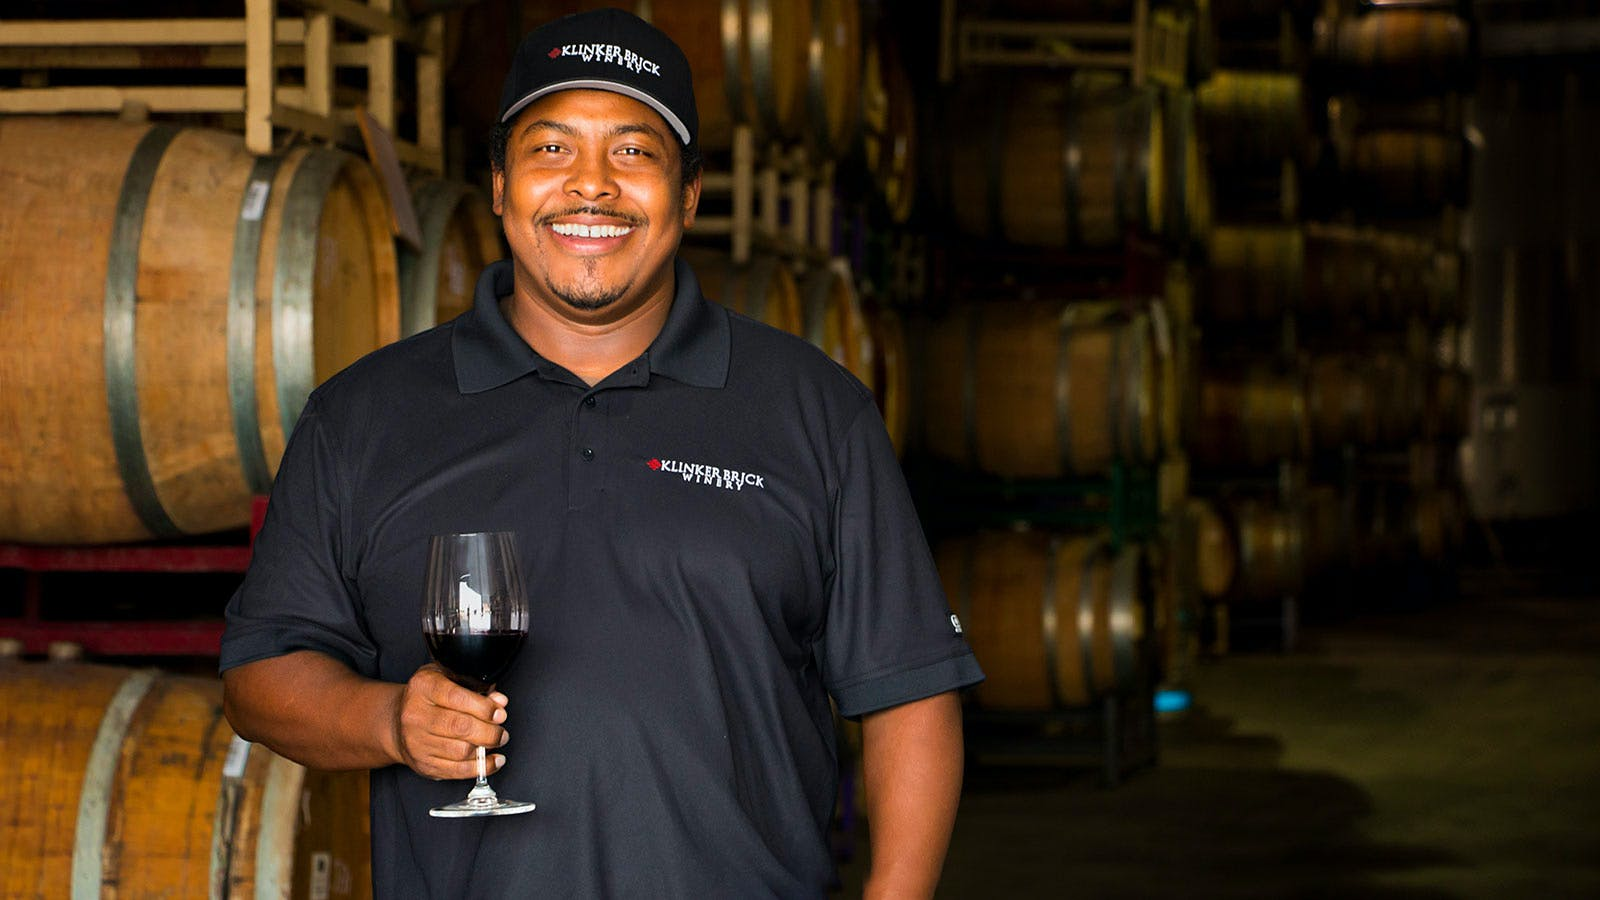 Walking the Walk of Bringing Diversity to Wine